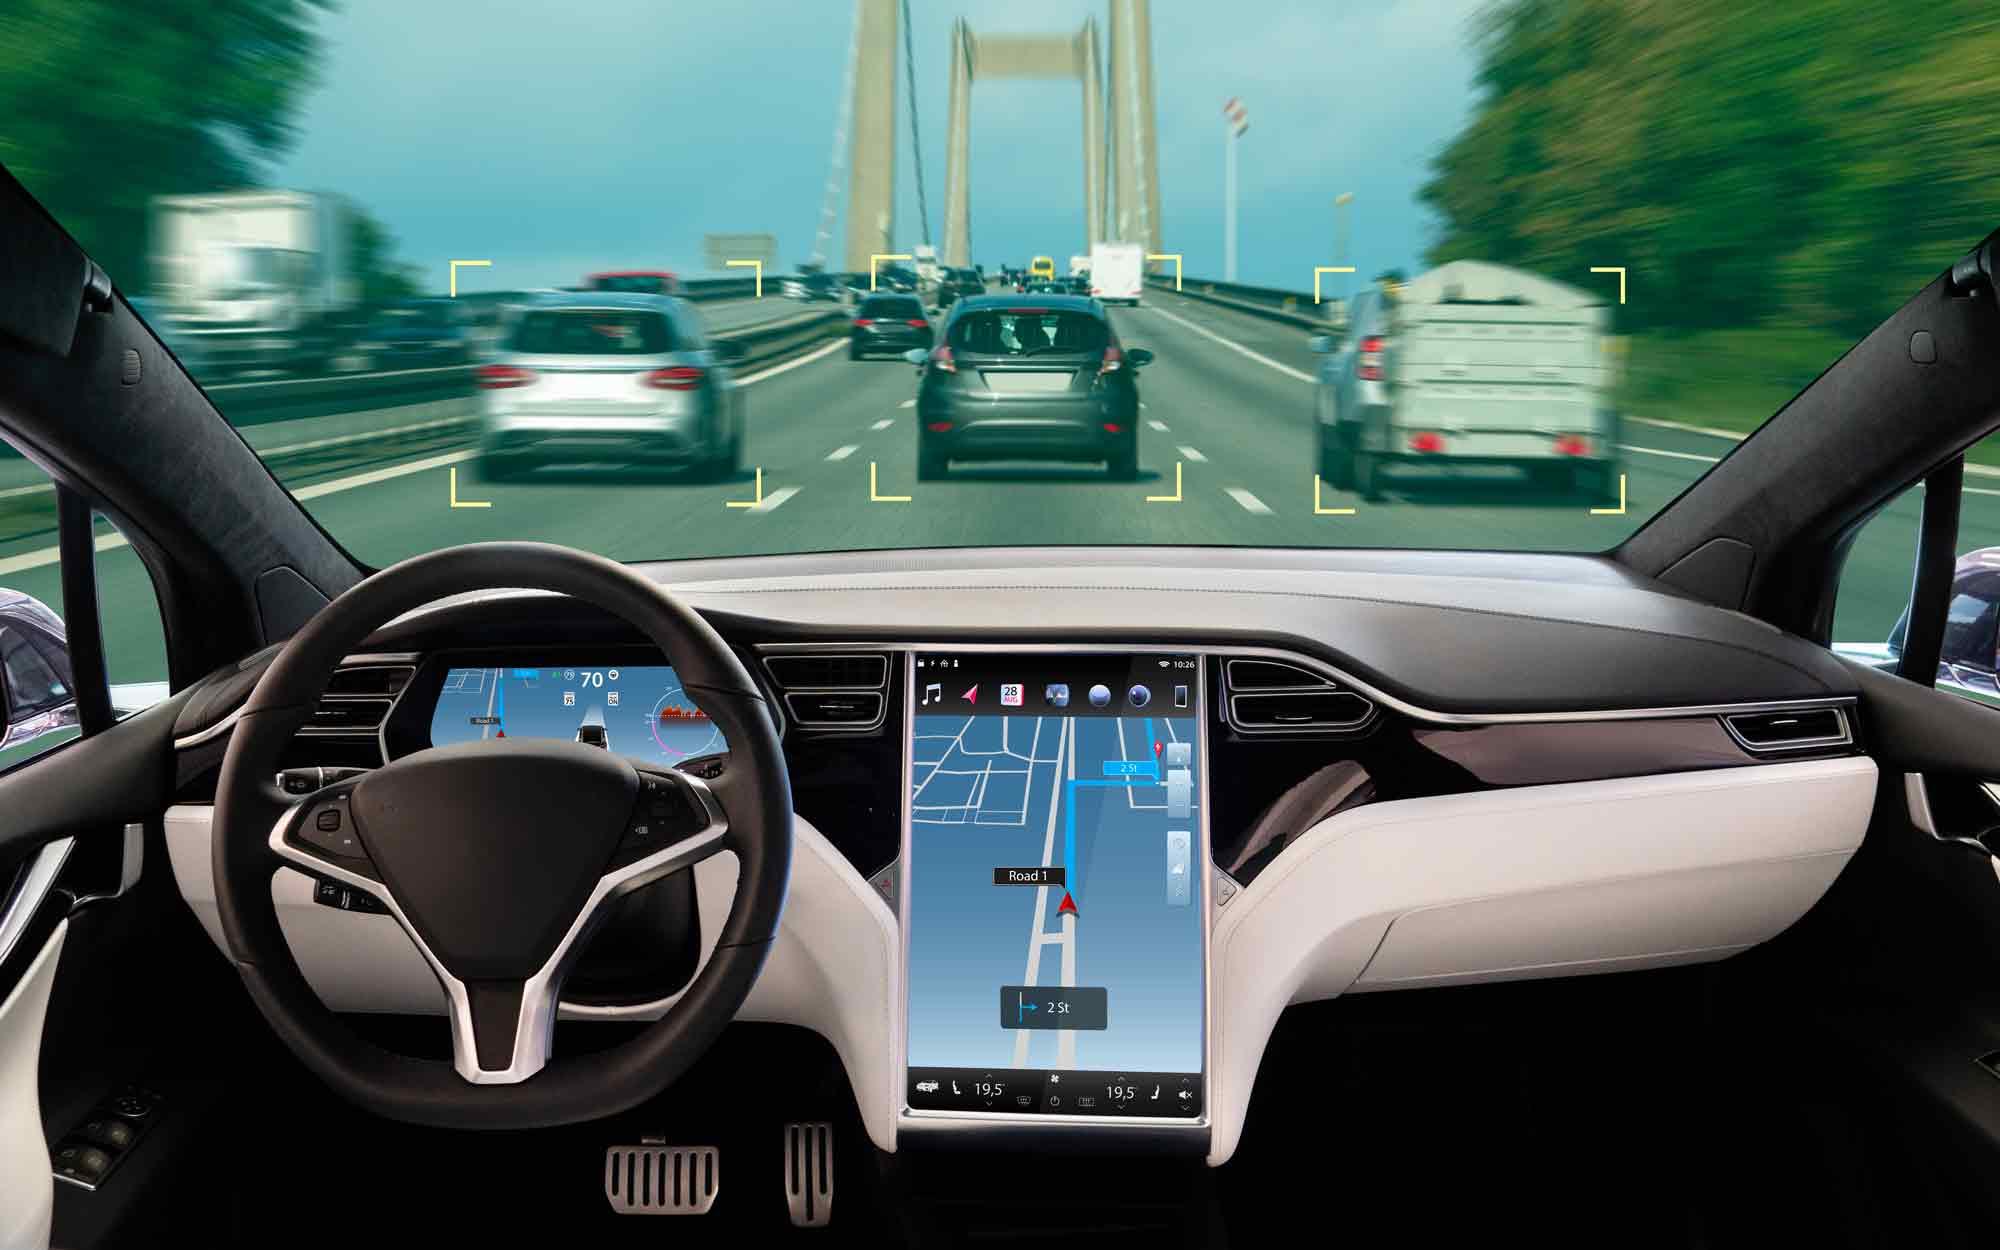 Guida Autonoma da un abitacolo Tesla